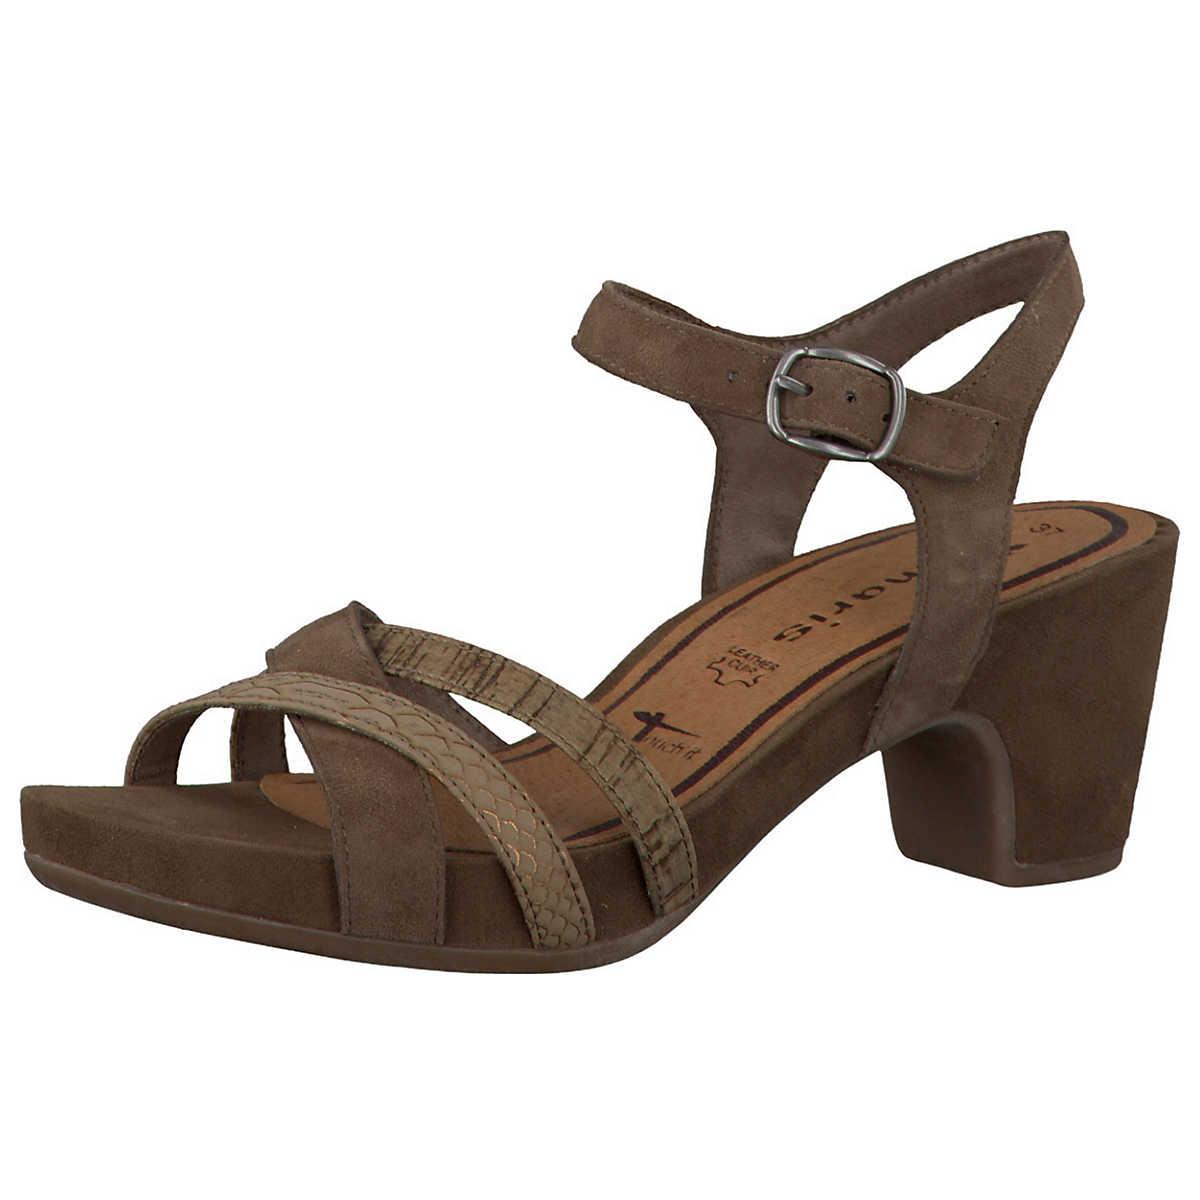 tamaris jule sandaletten braun 3860819 bei guenstige. Black Bedroom Furniture Sets. Home Design Ideas